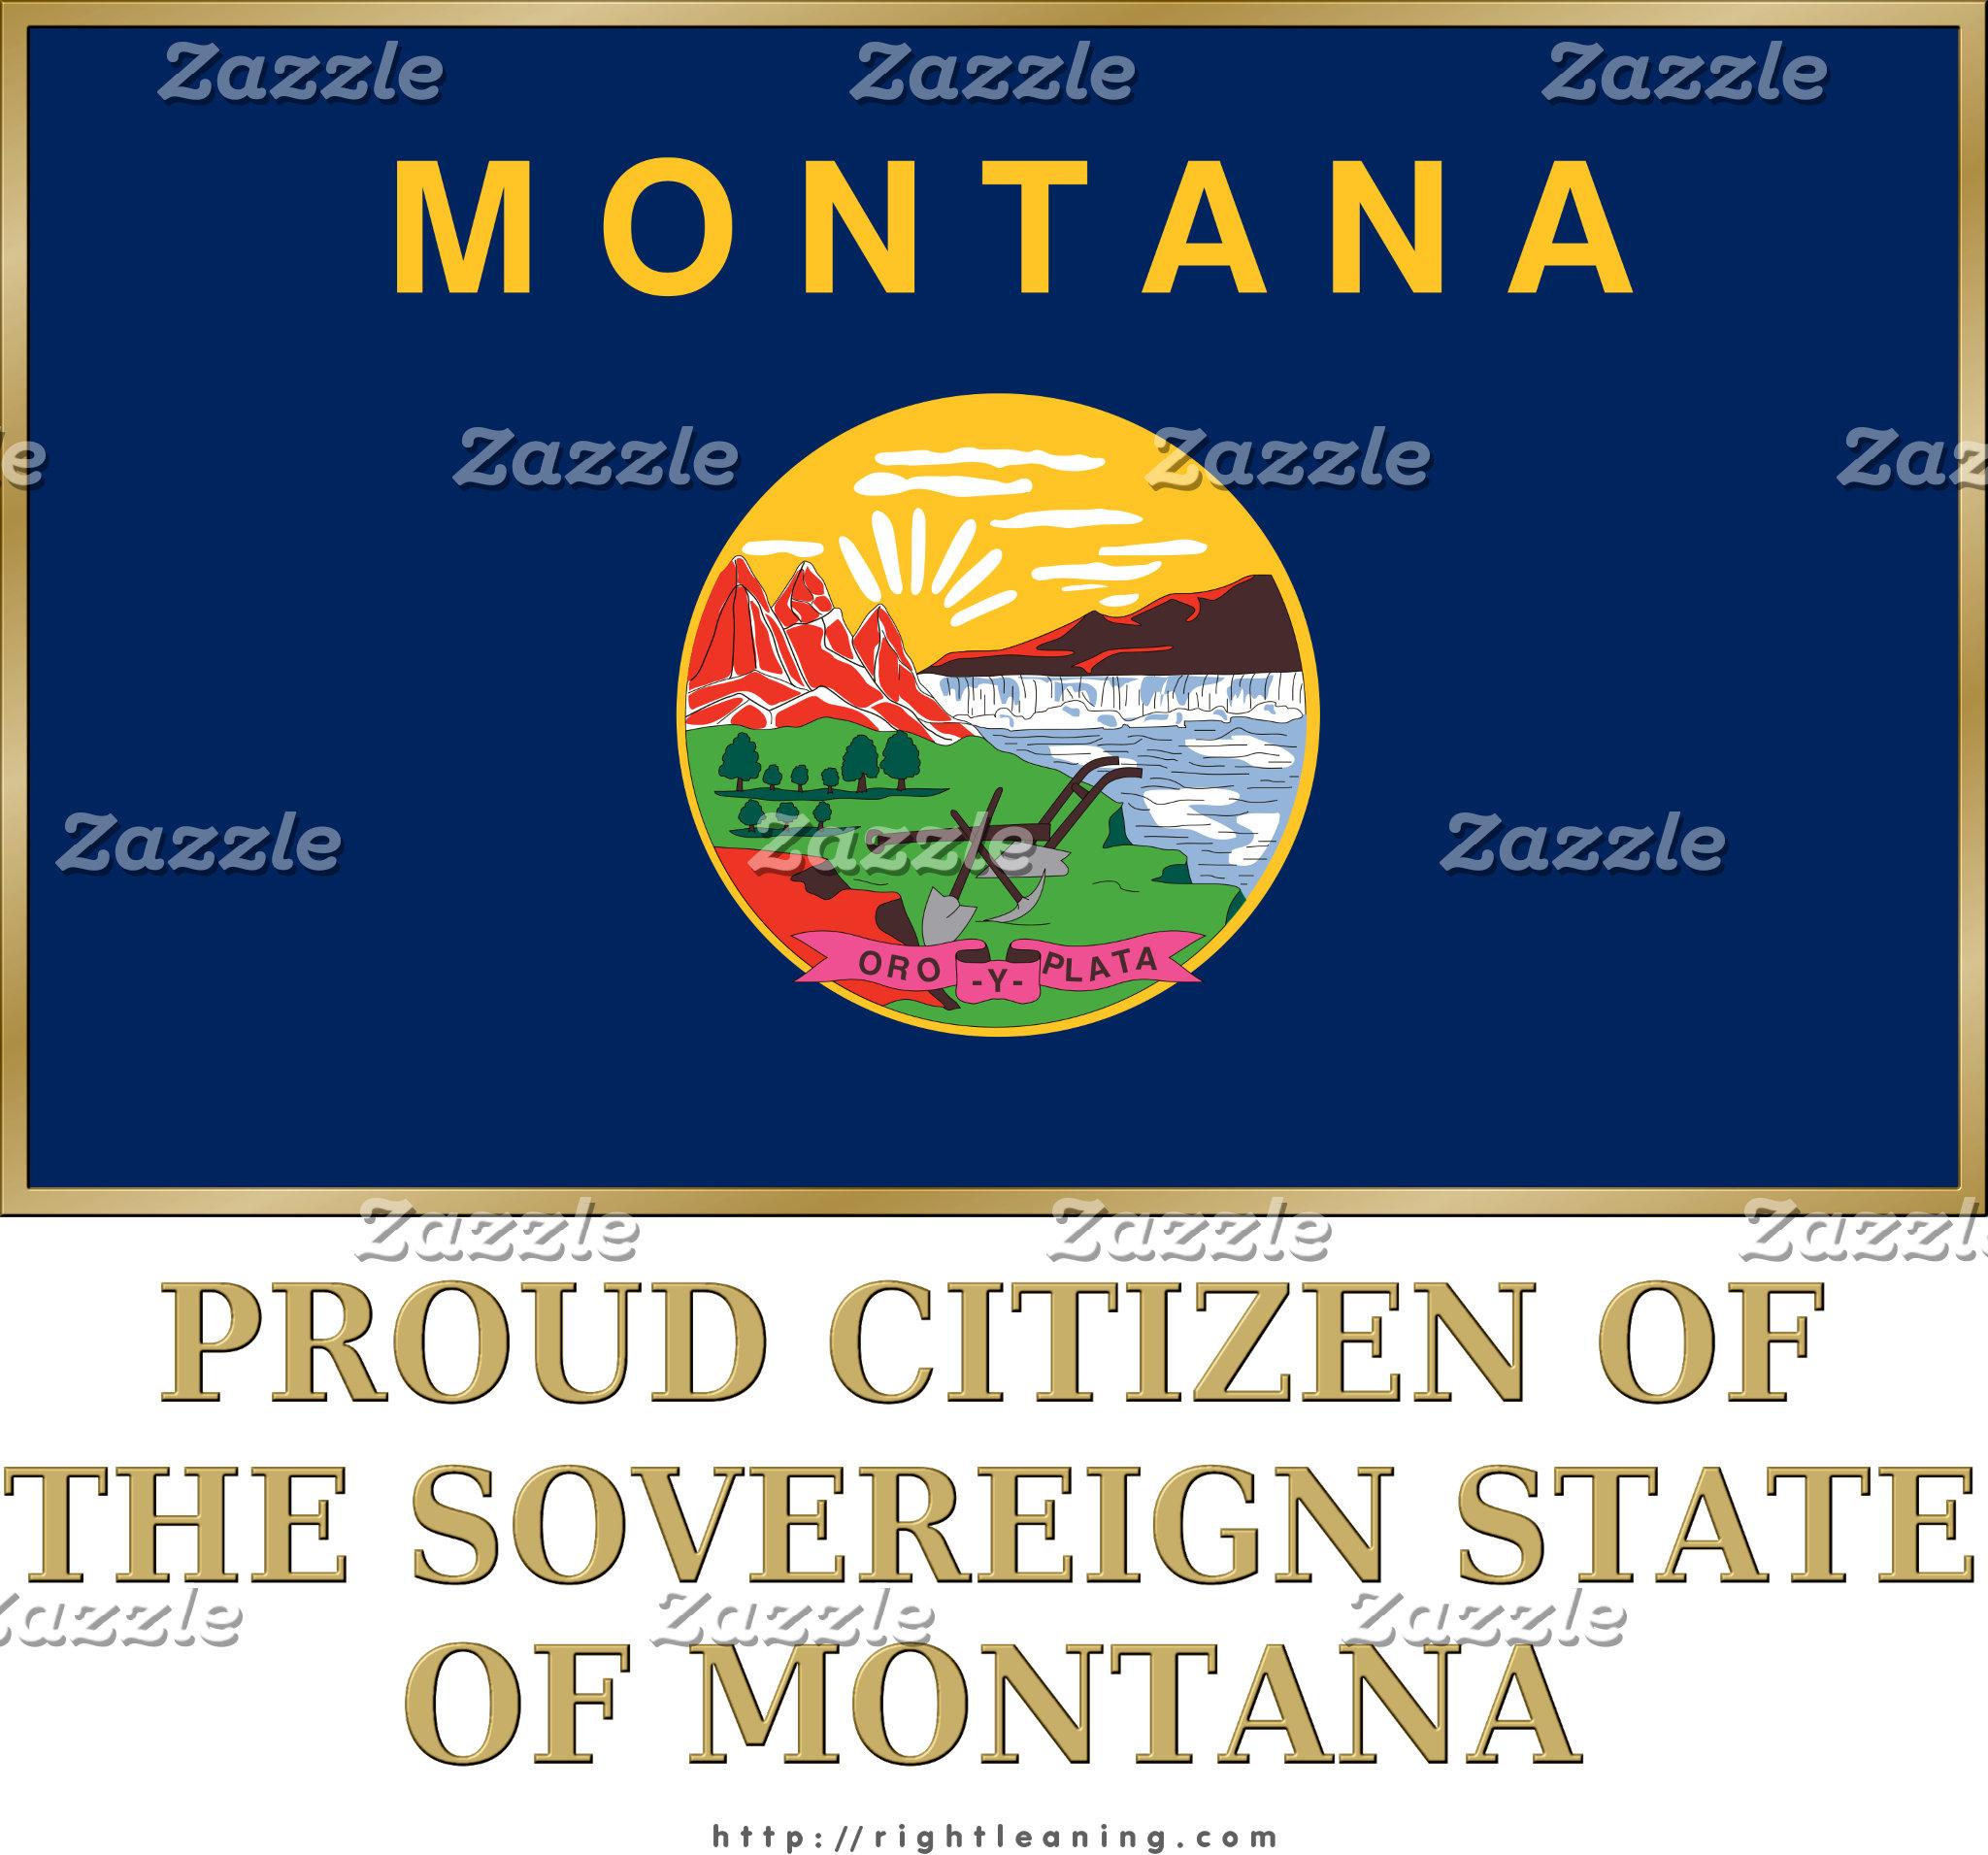 Sovereign States